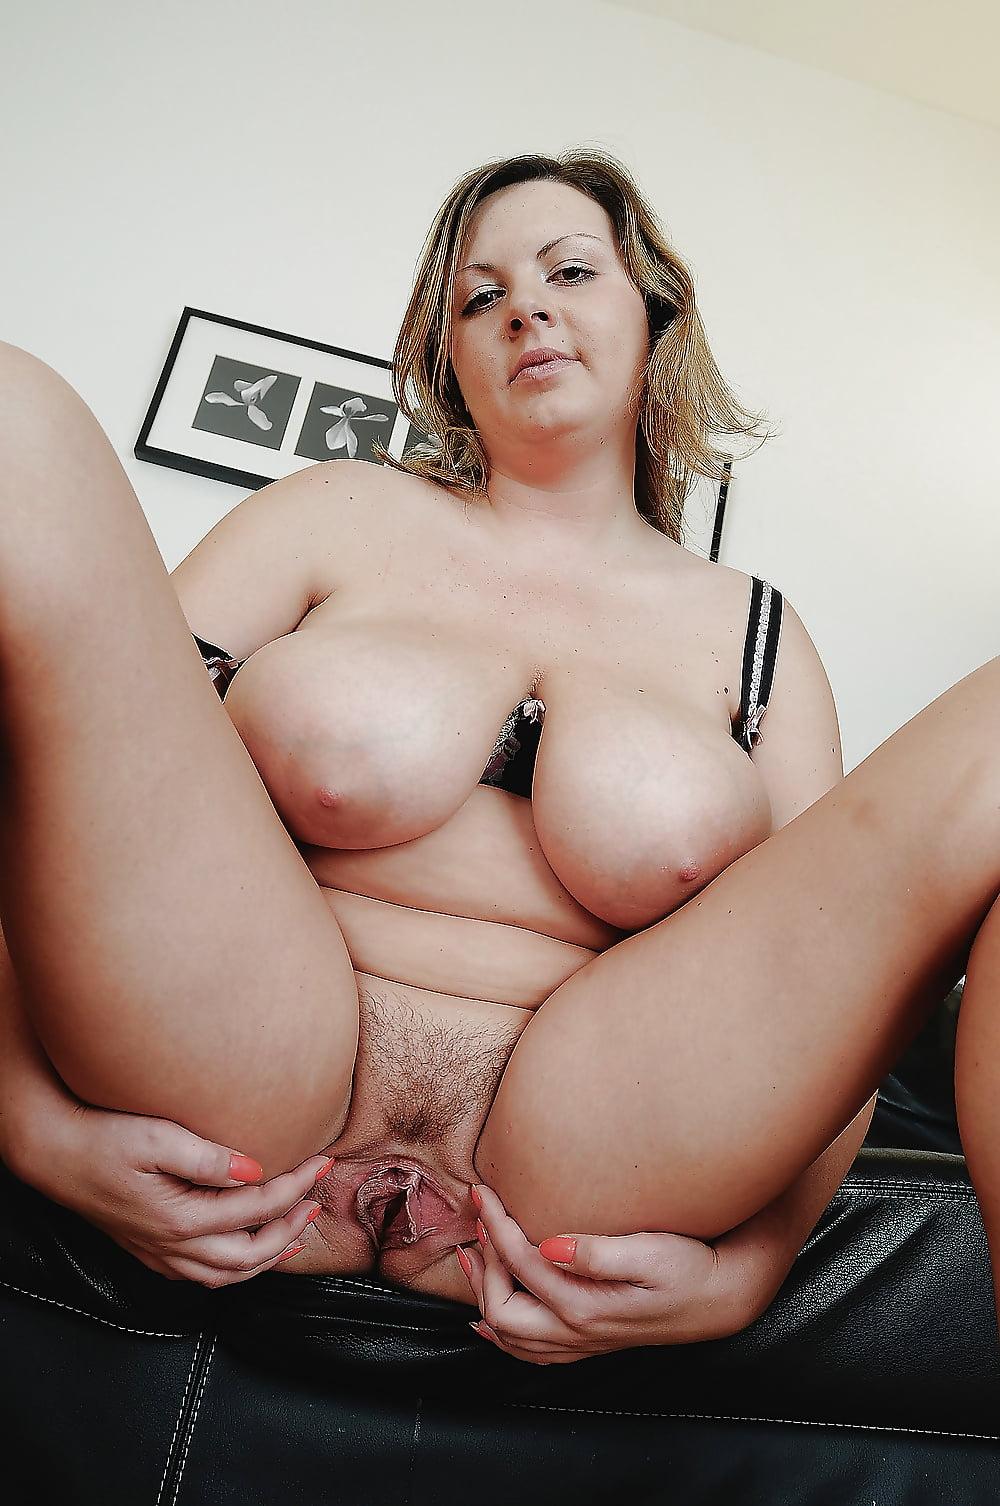 Homemade chubby brunette milf tits